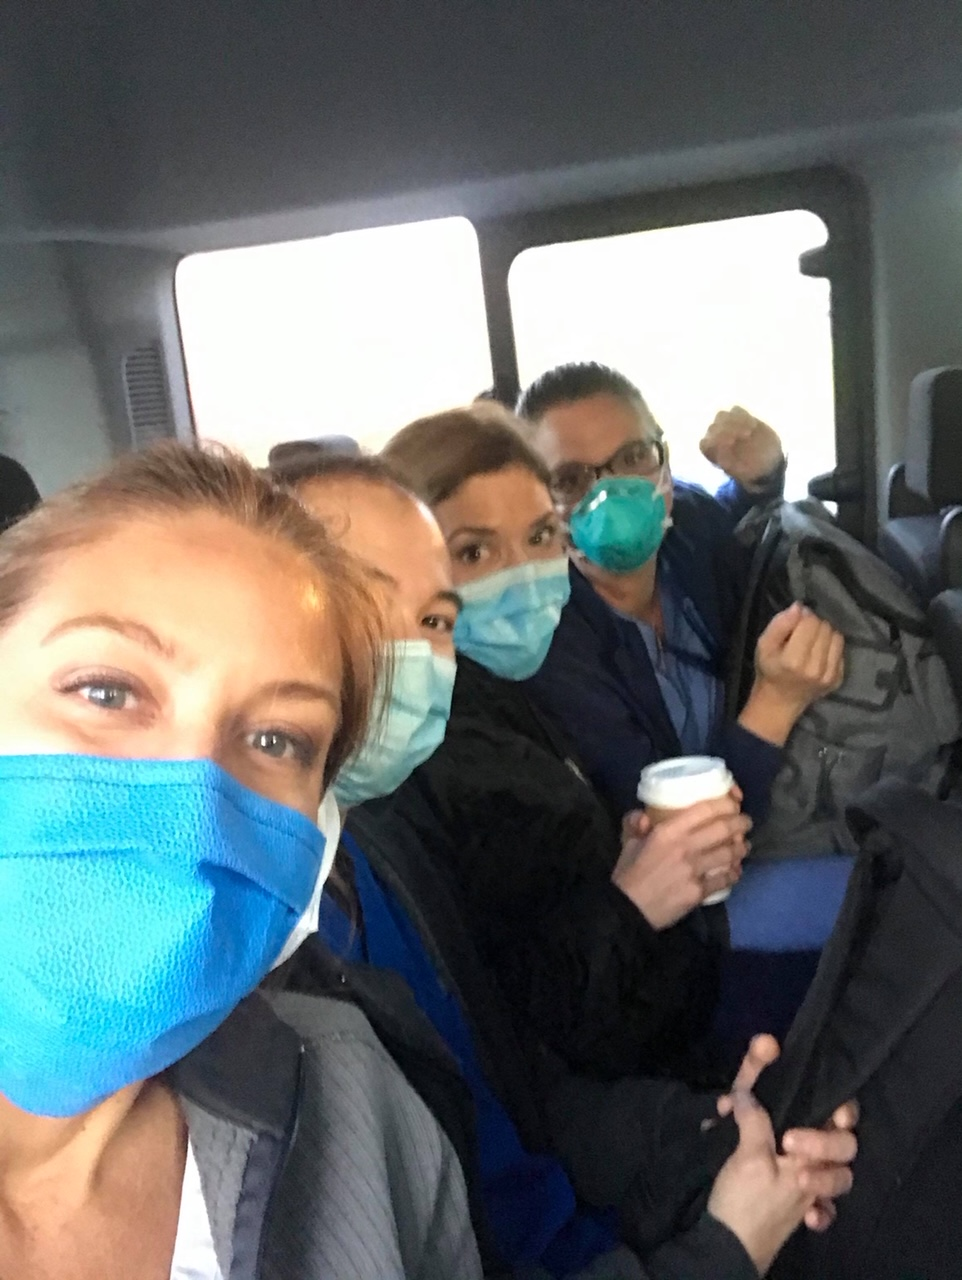 Group of medical professionals in N99 masks.